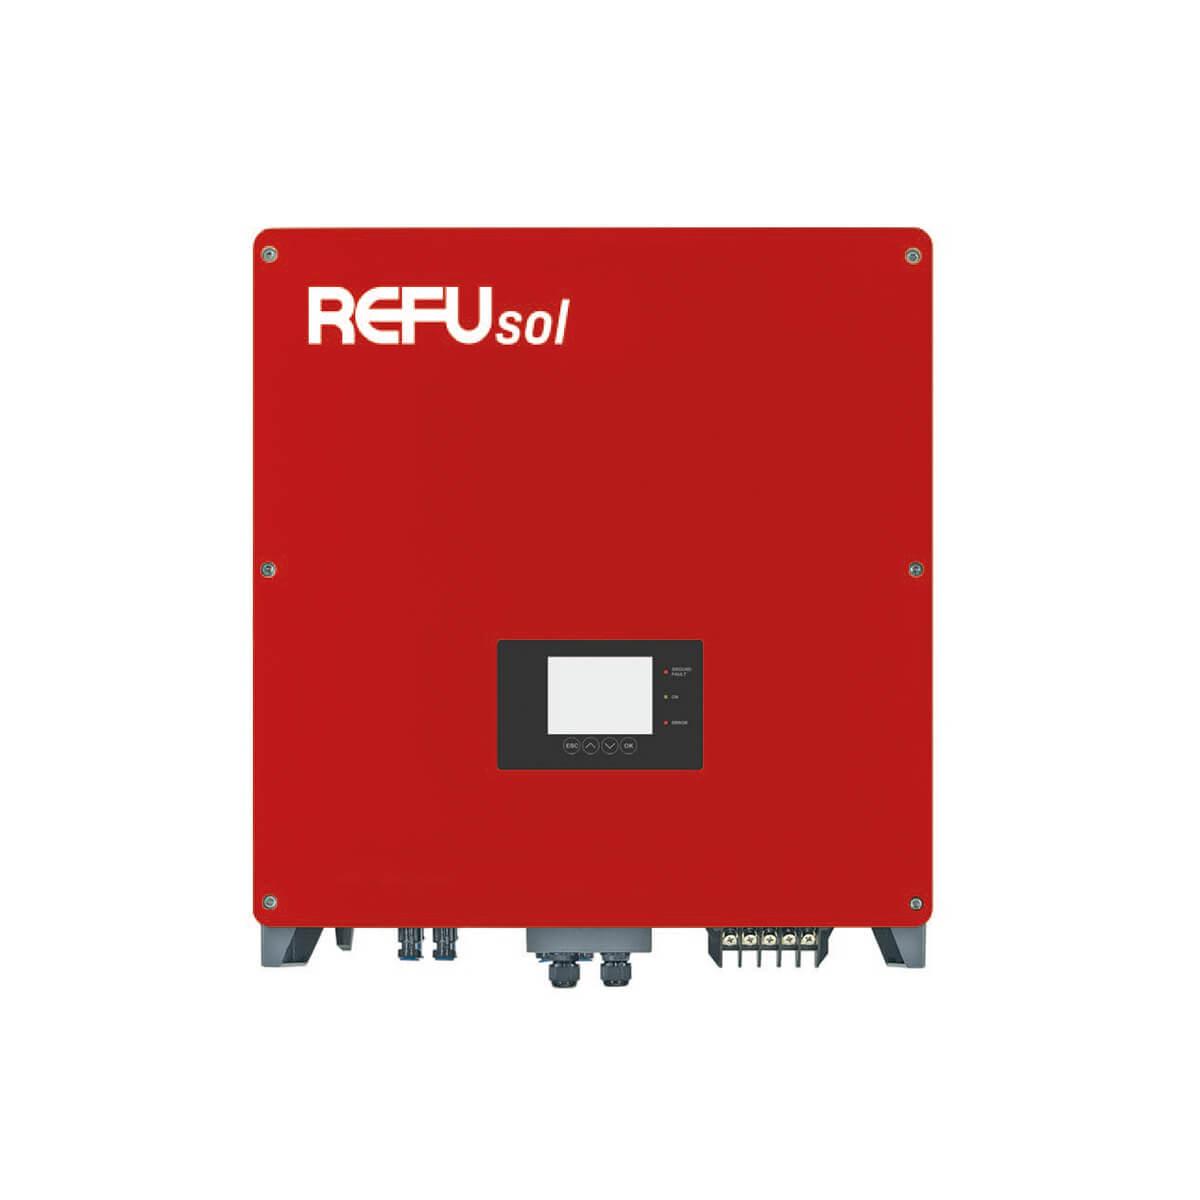 refusol 20kW inverter, refusol 20k-2t 20kW inverter, refusol 20k-2t inverter, refusol 20k-2t, refusol 20 kW, REFUSOL 20KW